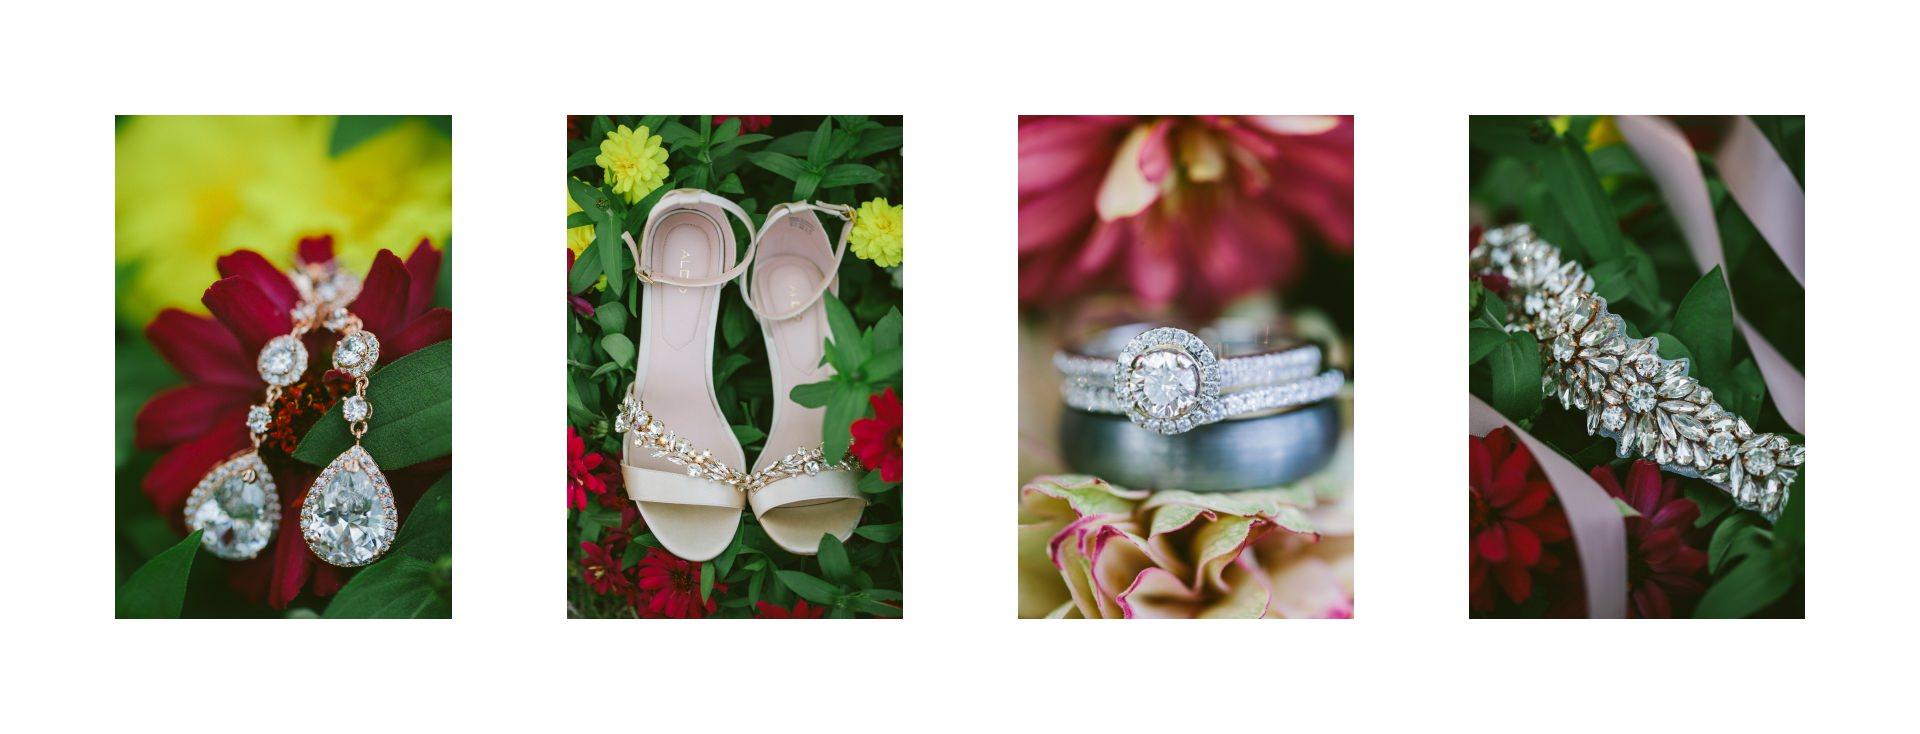 Catawba Island Club Wedding Photographer 1 10.jpg